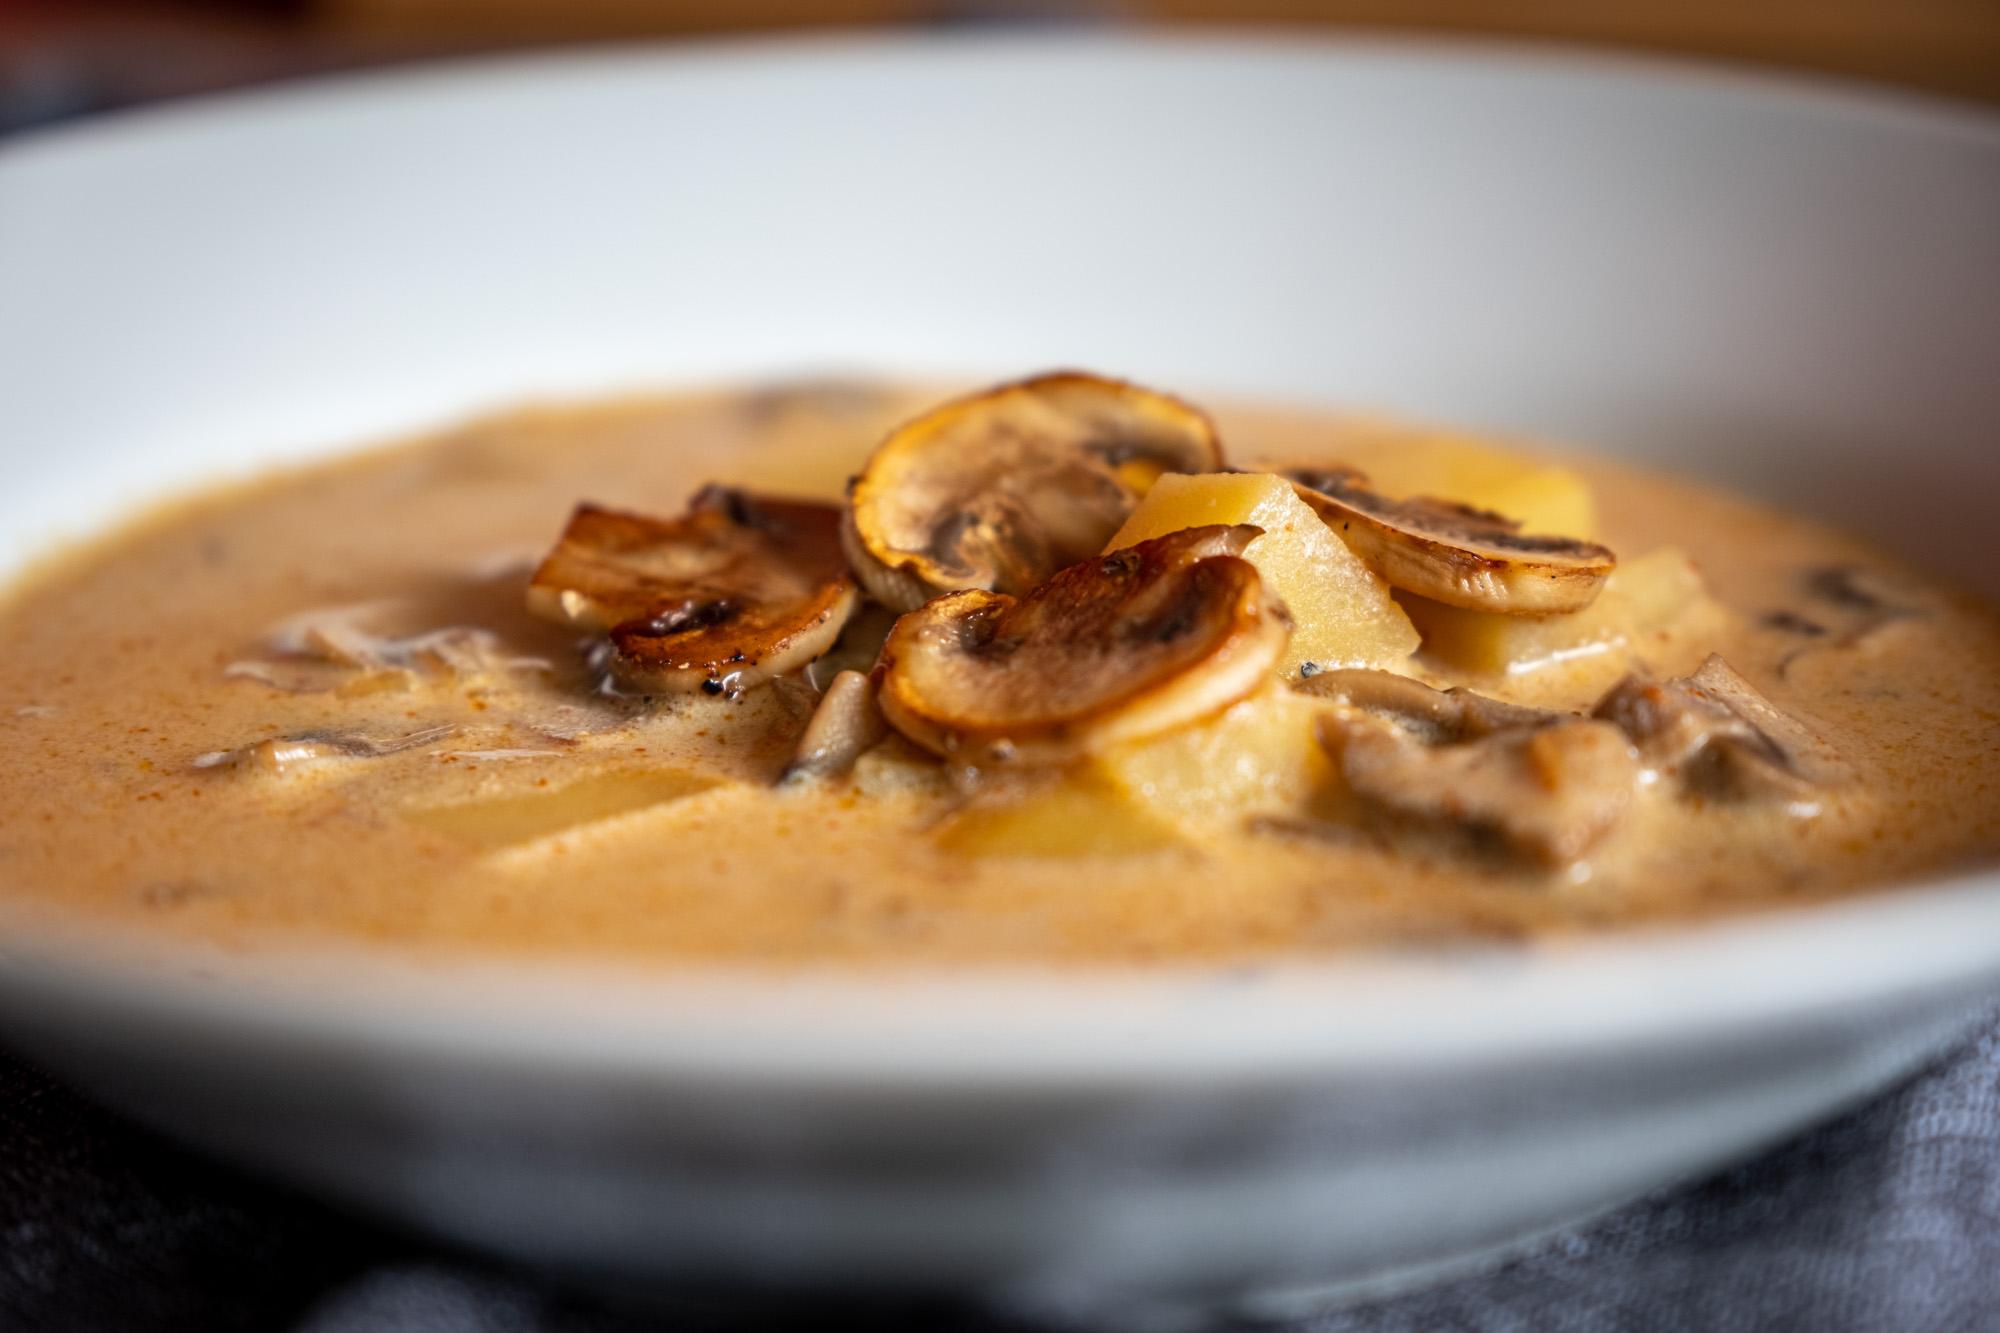 Žampiónová polévka se smetanou a paprikou